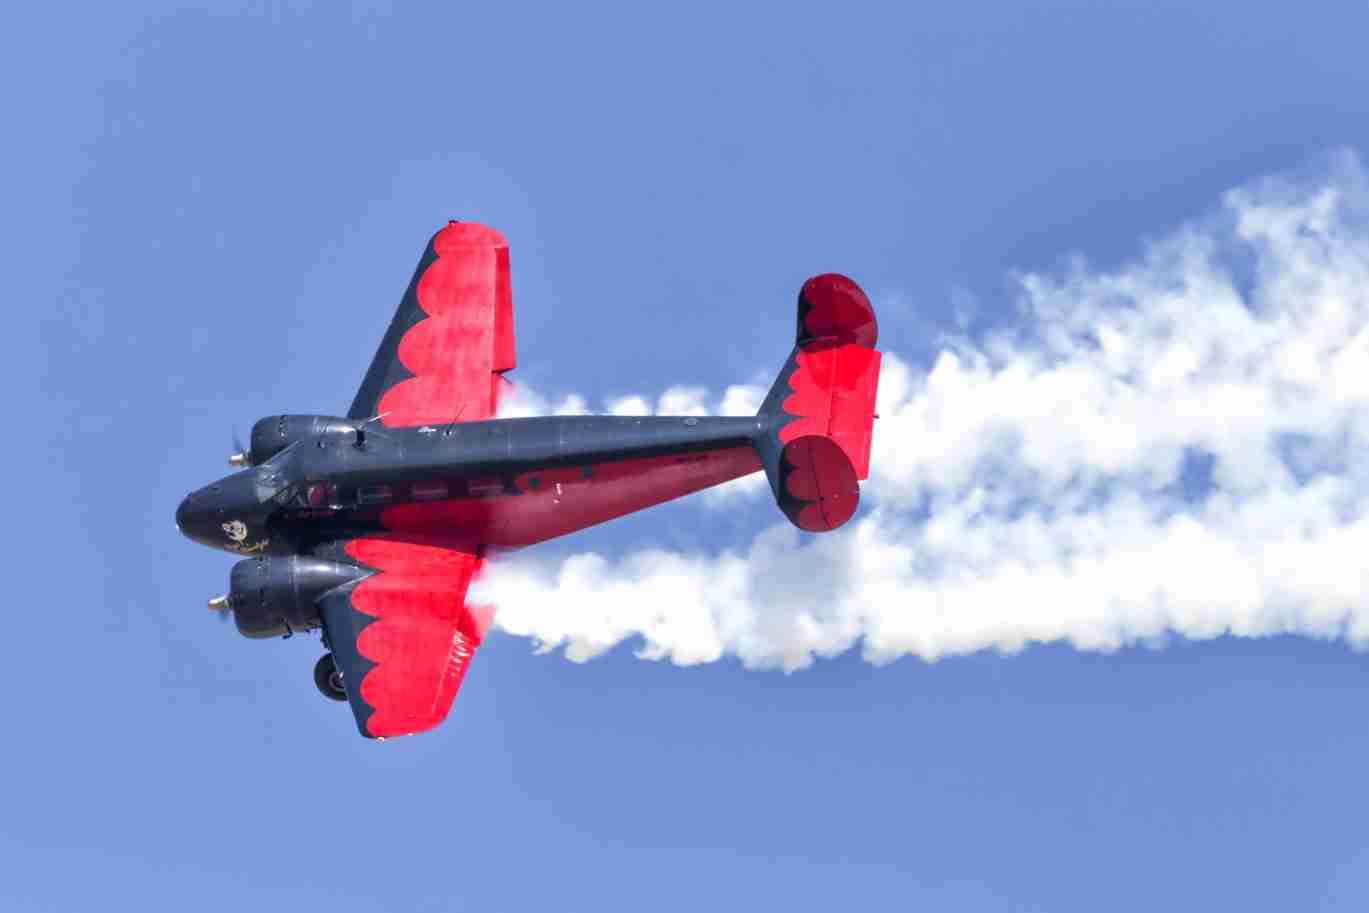 Beech 18 Plane Flying Fast